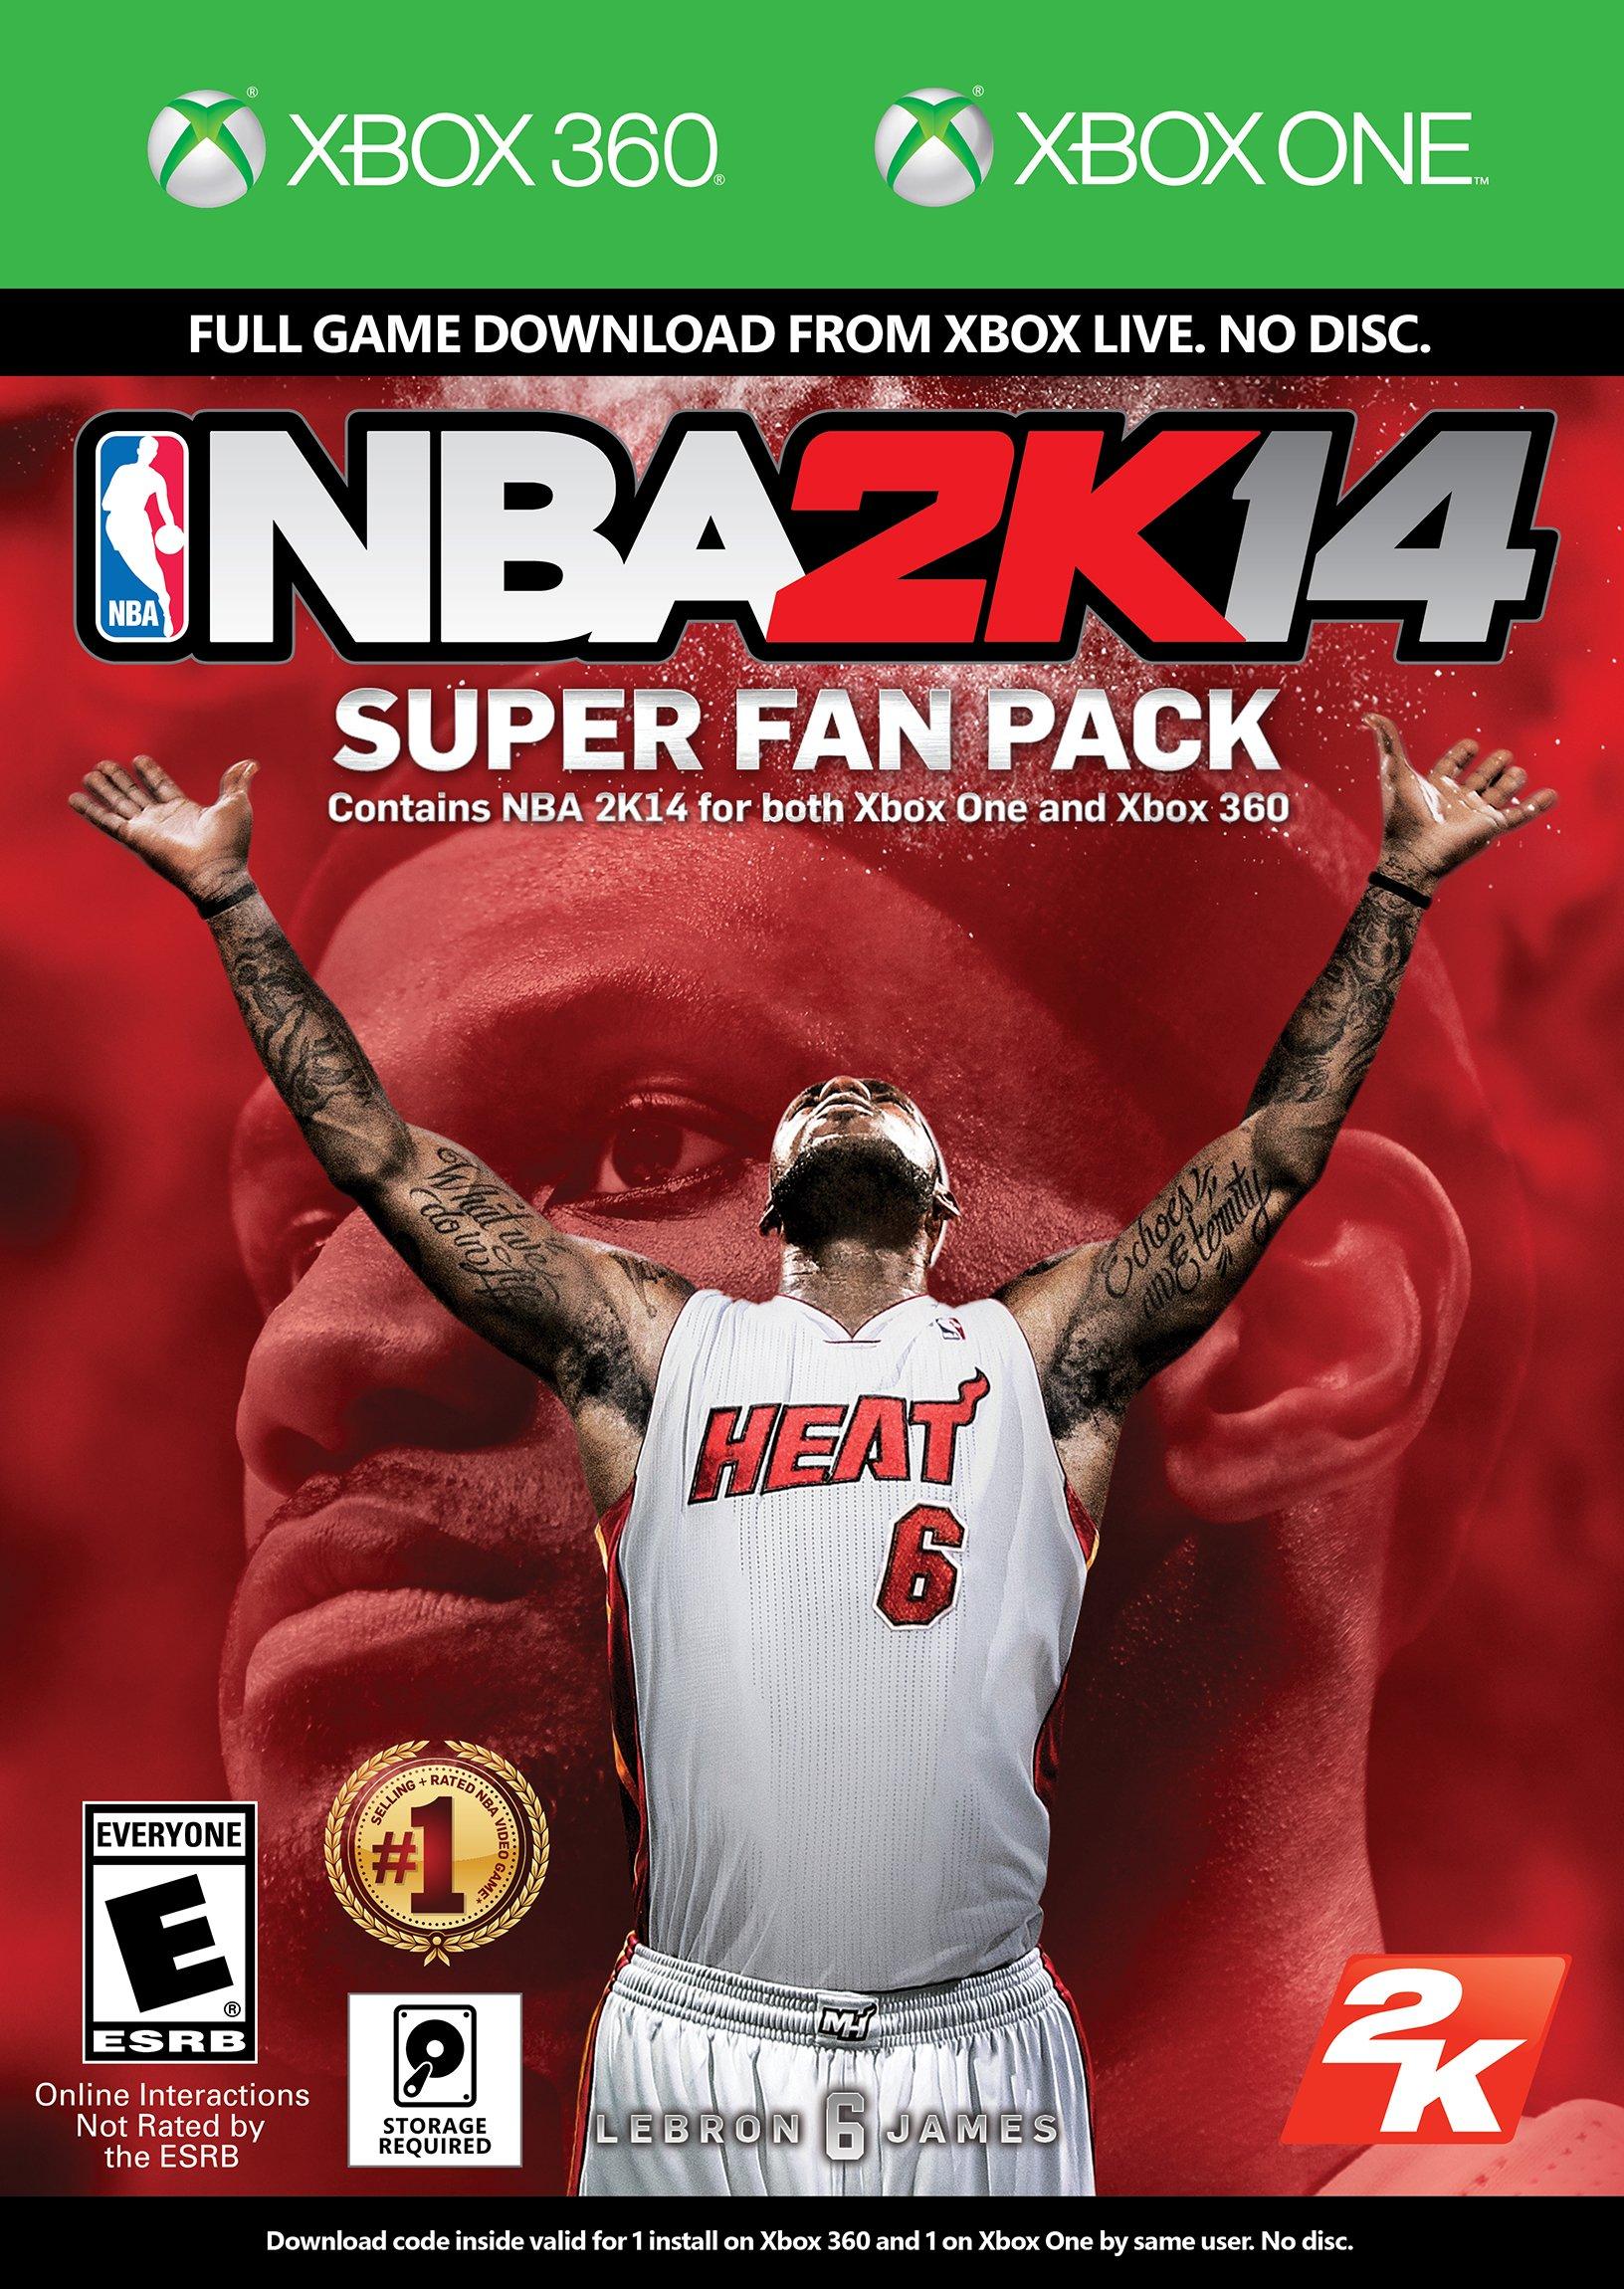 NBA 2k14 Super Fan Pack Release Date (Xbox 360, PS3)